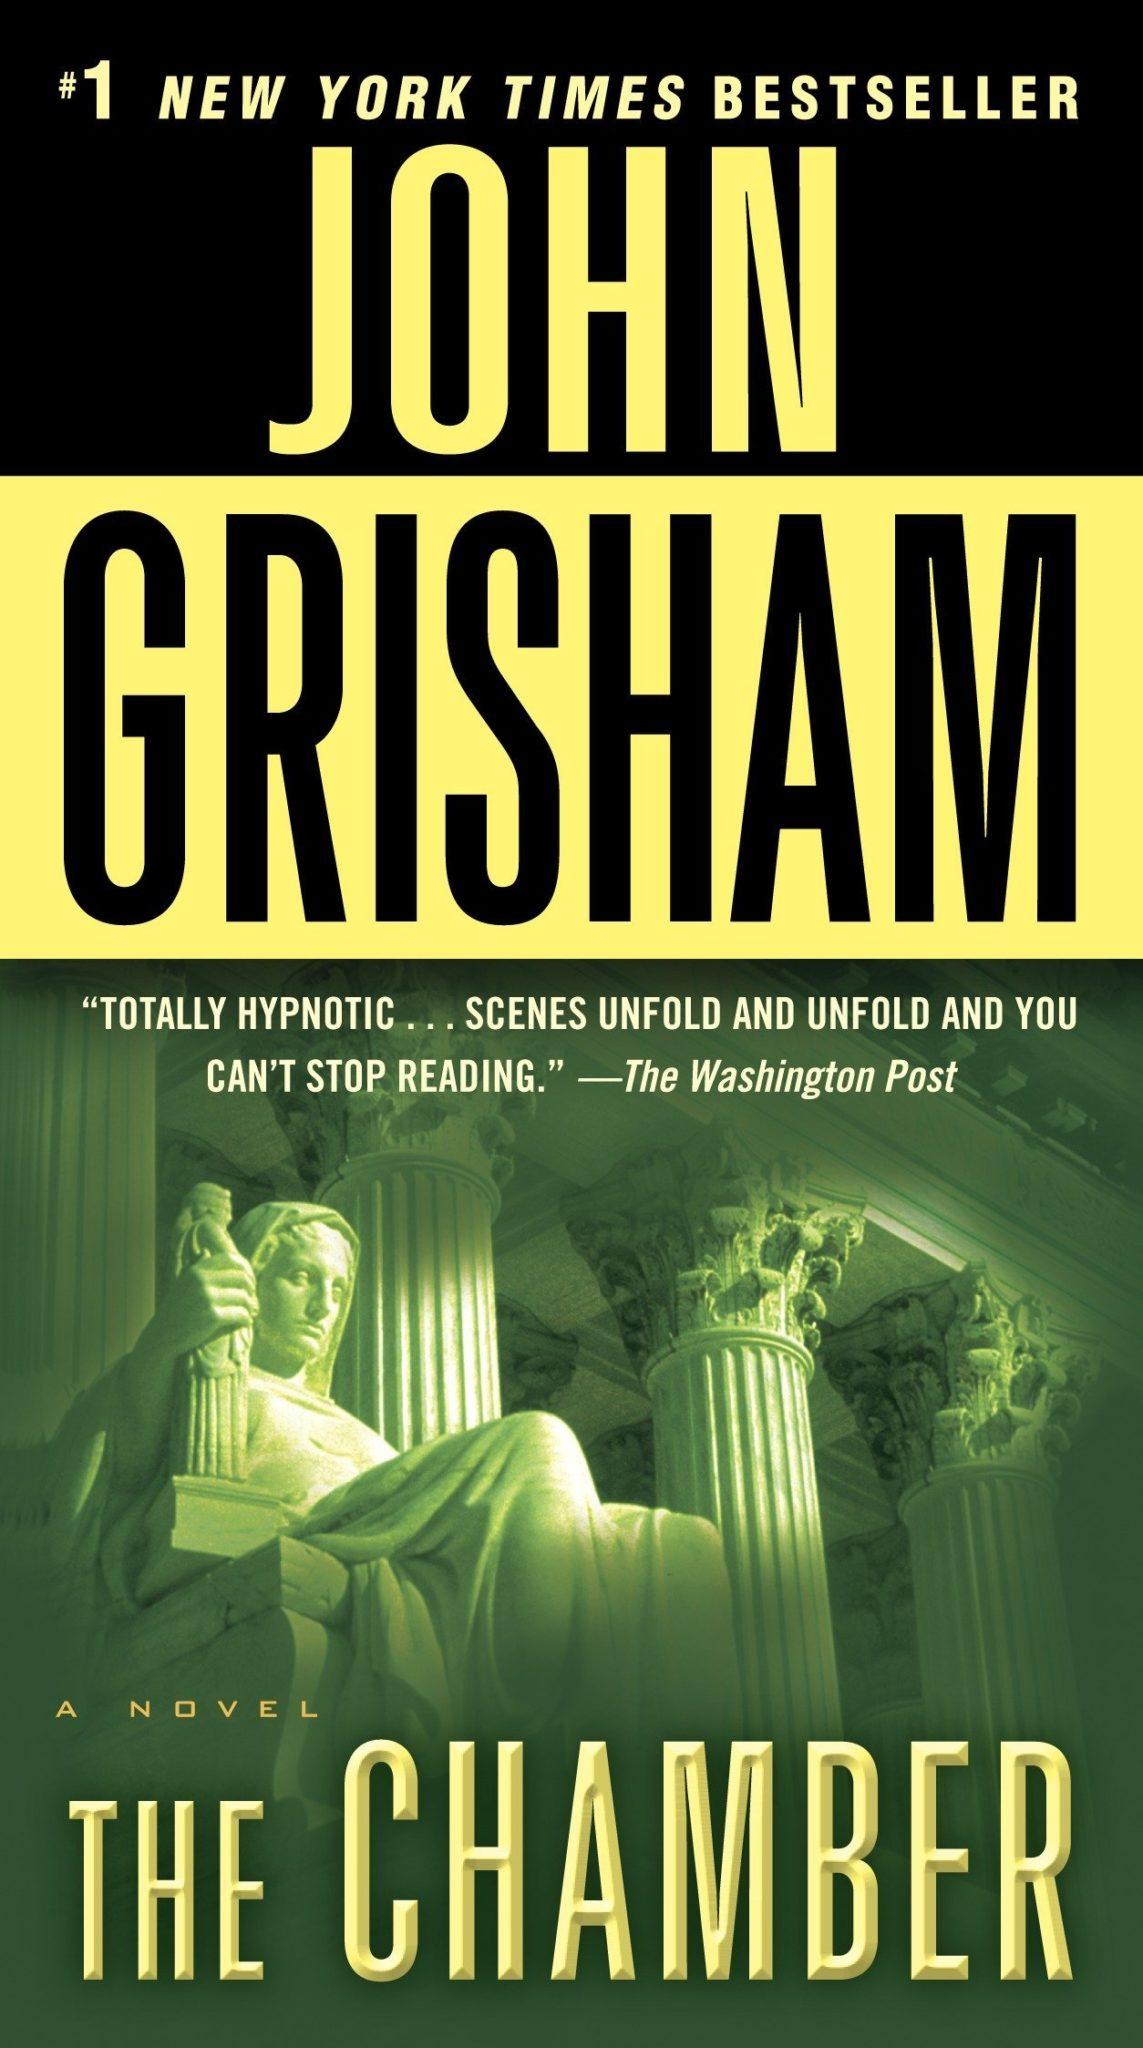 John Grisham books 6